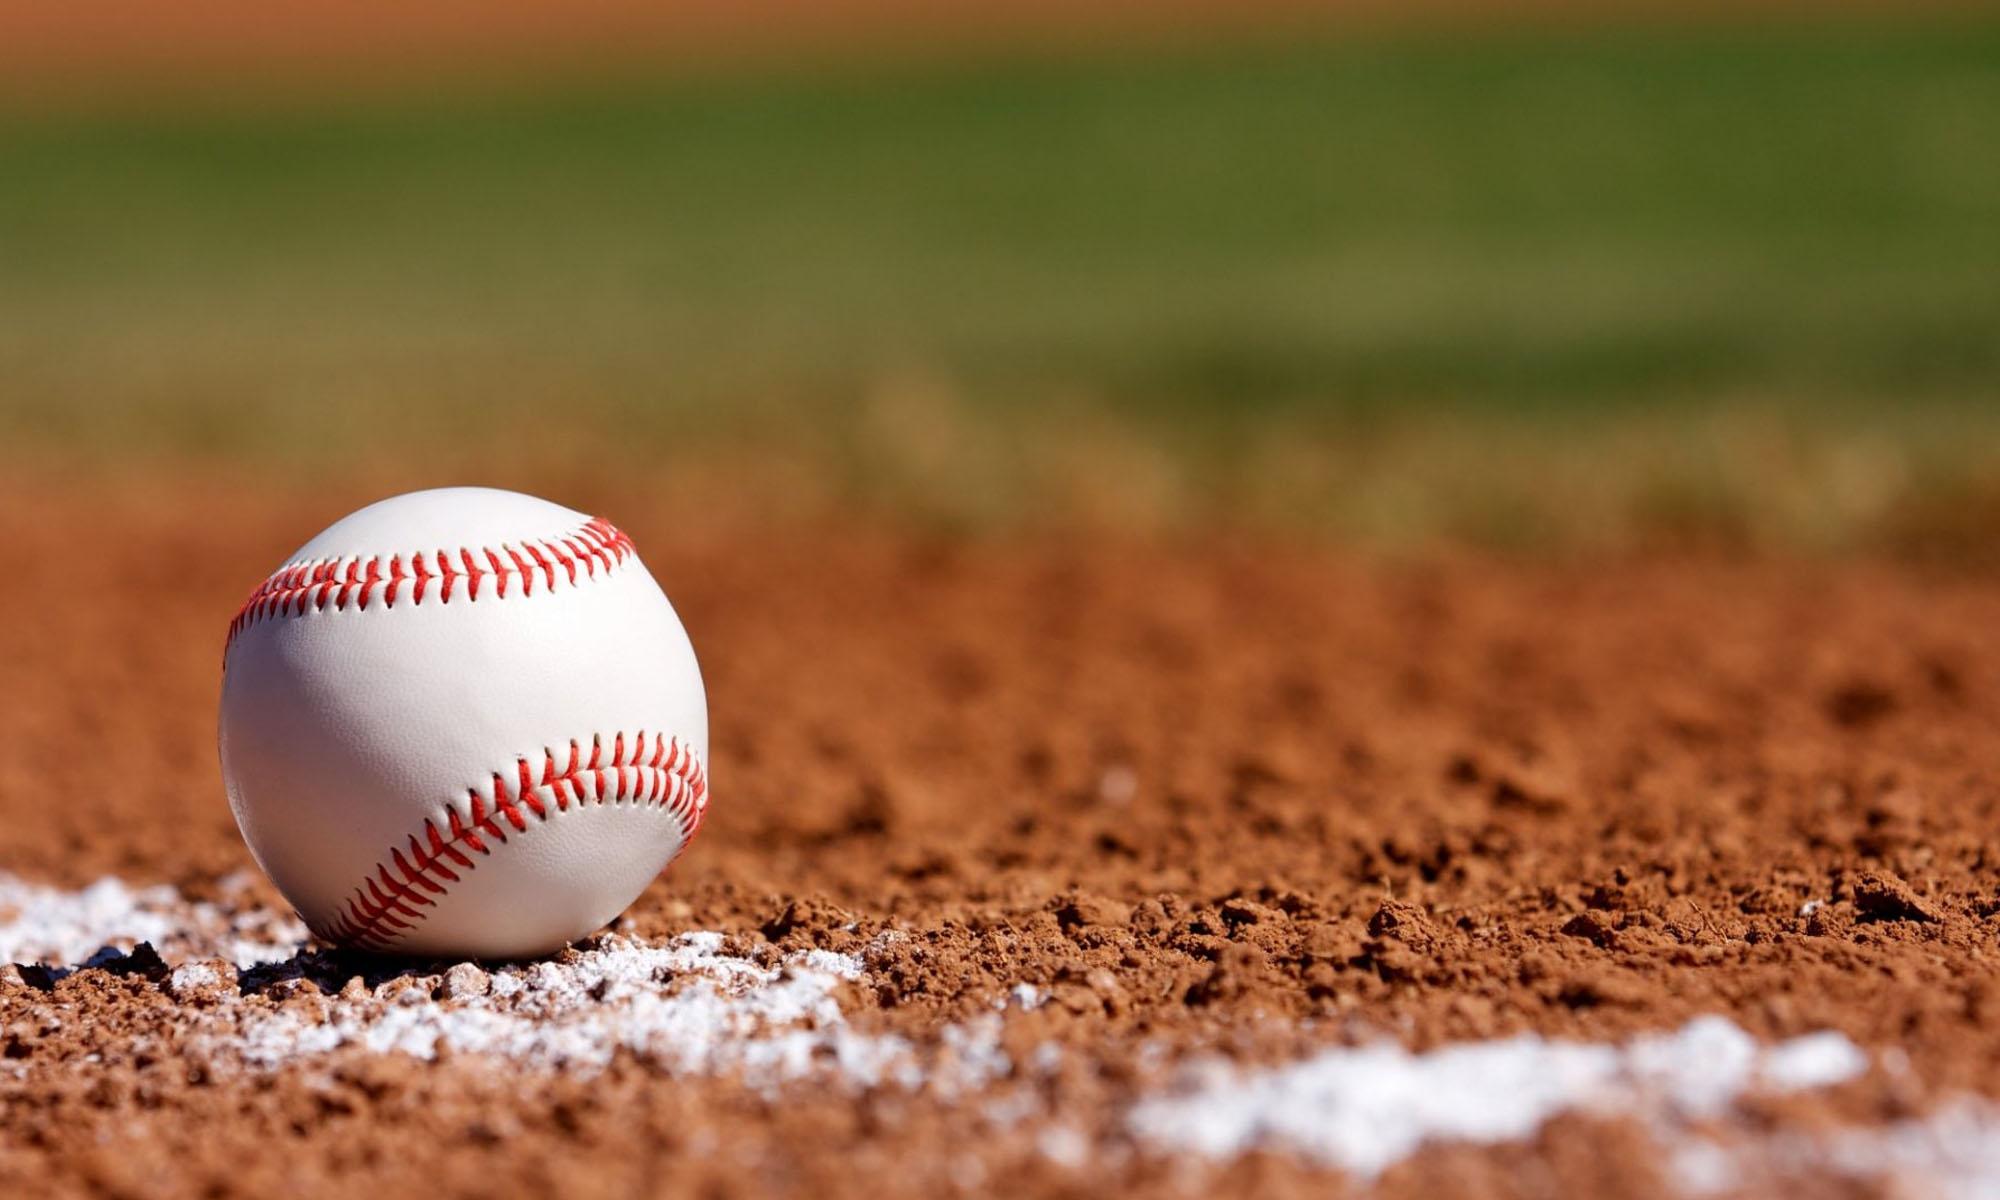 Four Morgan Co. baseball teams advance to state playoffs